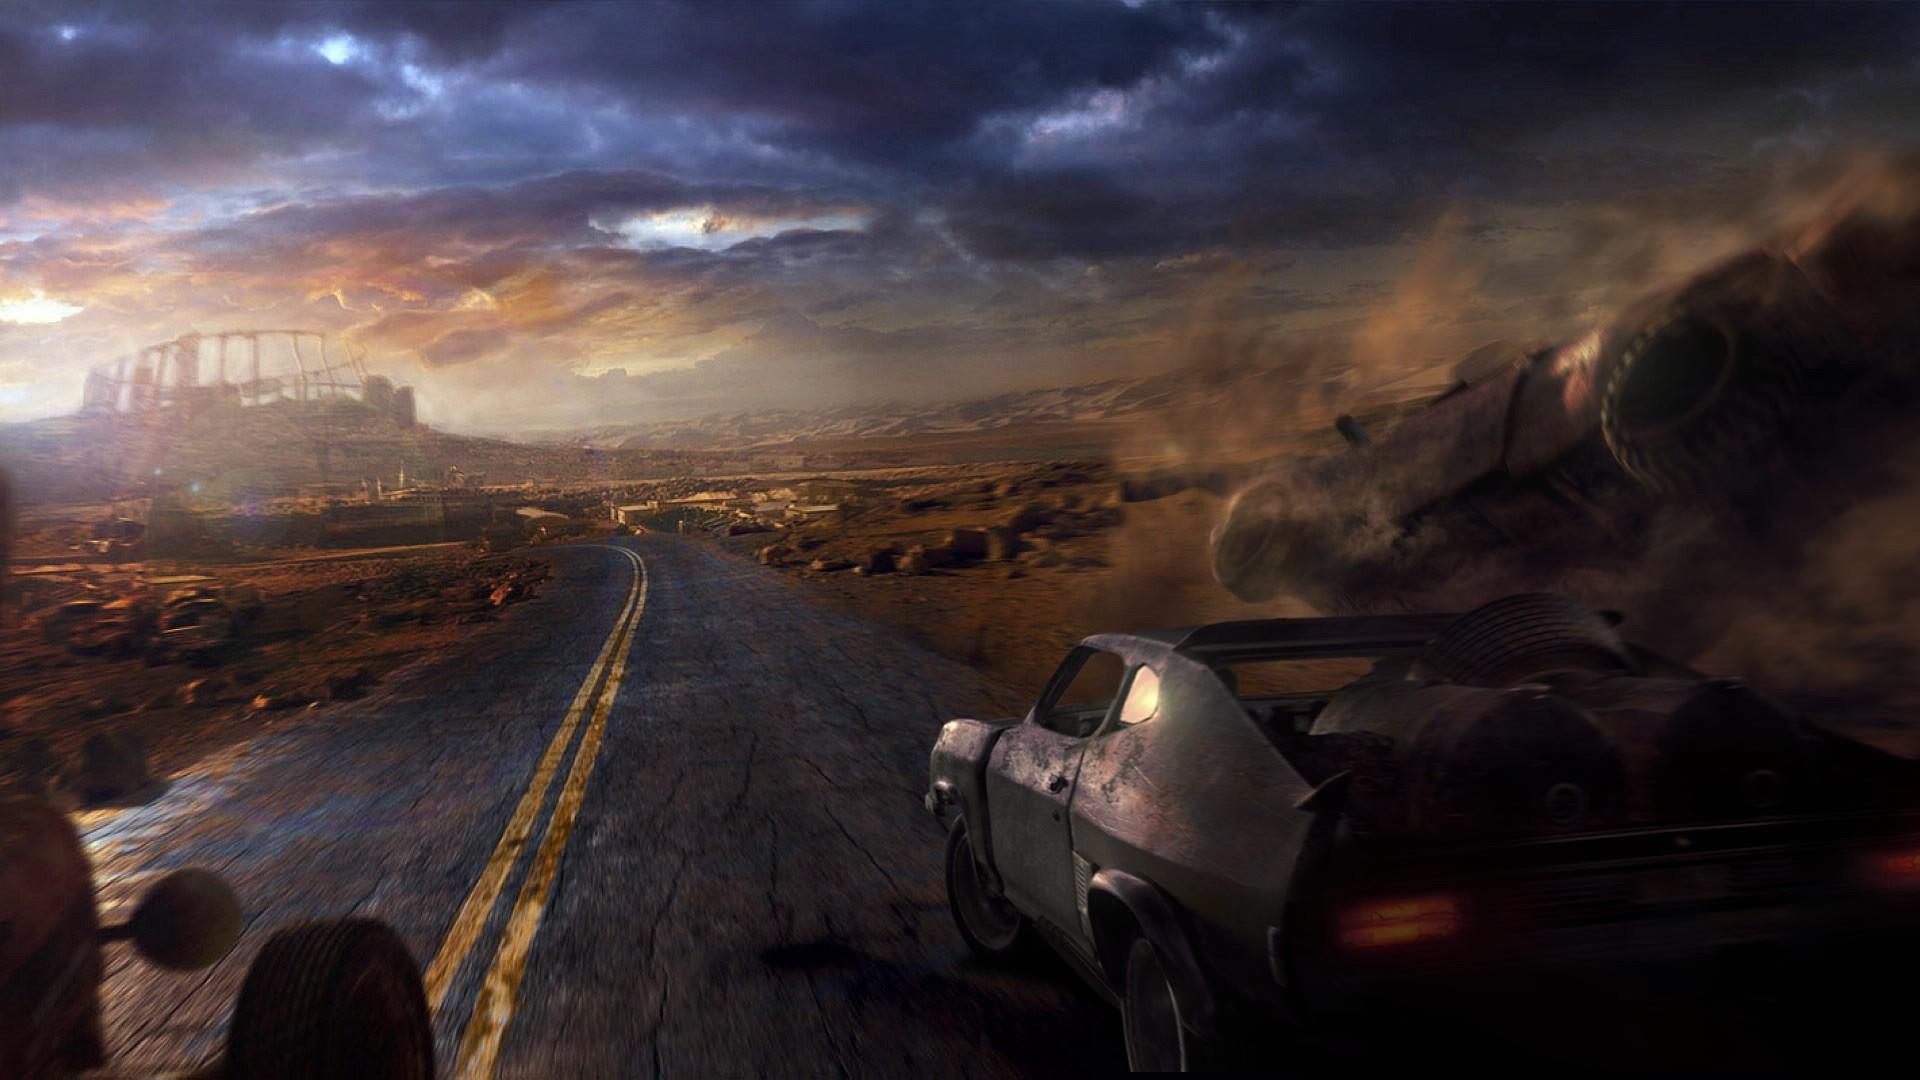 Mad Max Full HD Fond d'écran and Arrière-Plan | 1920x1080 ...